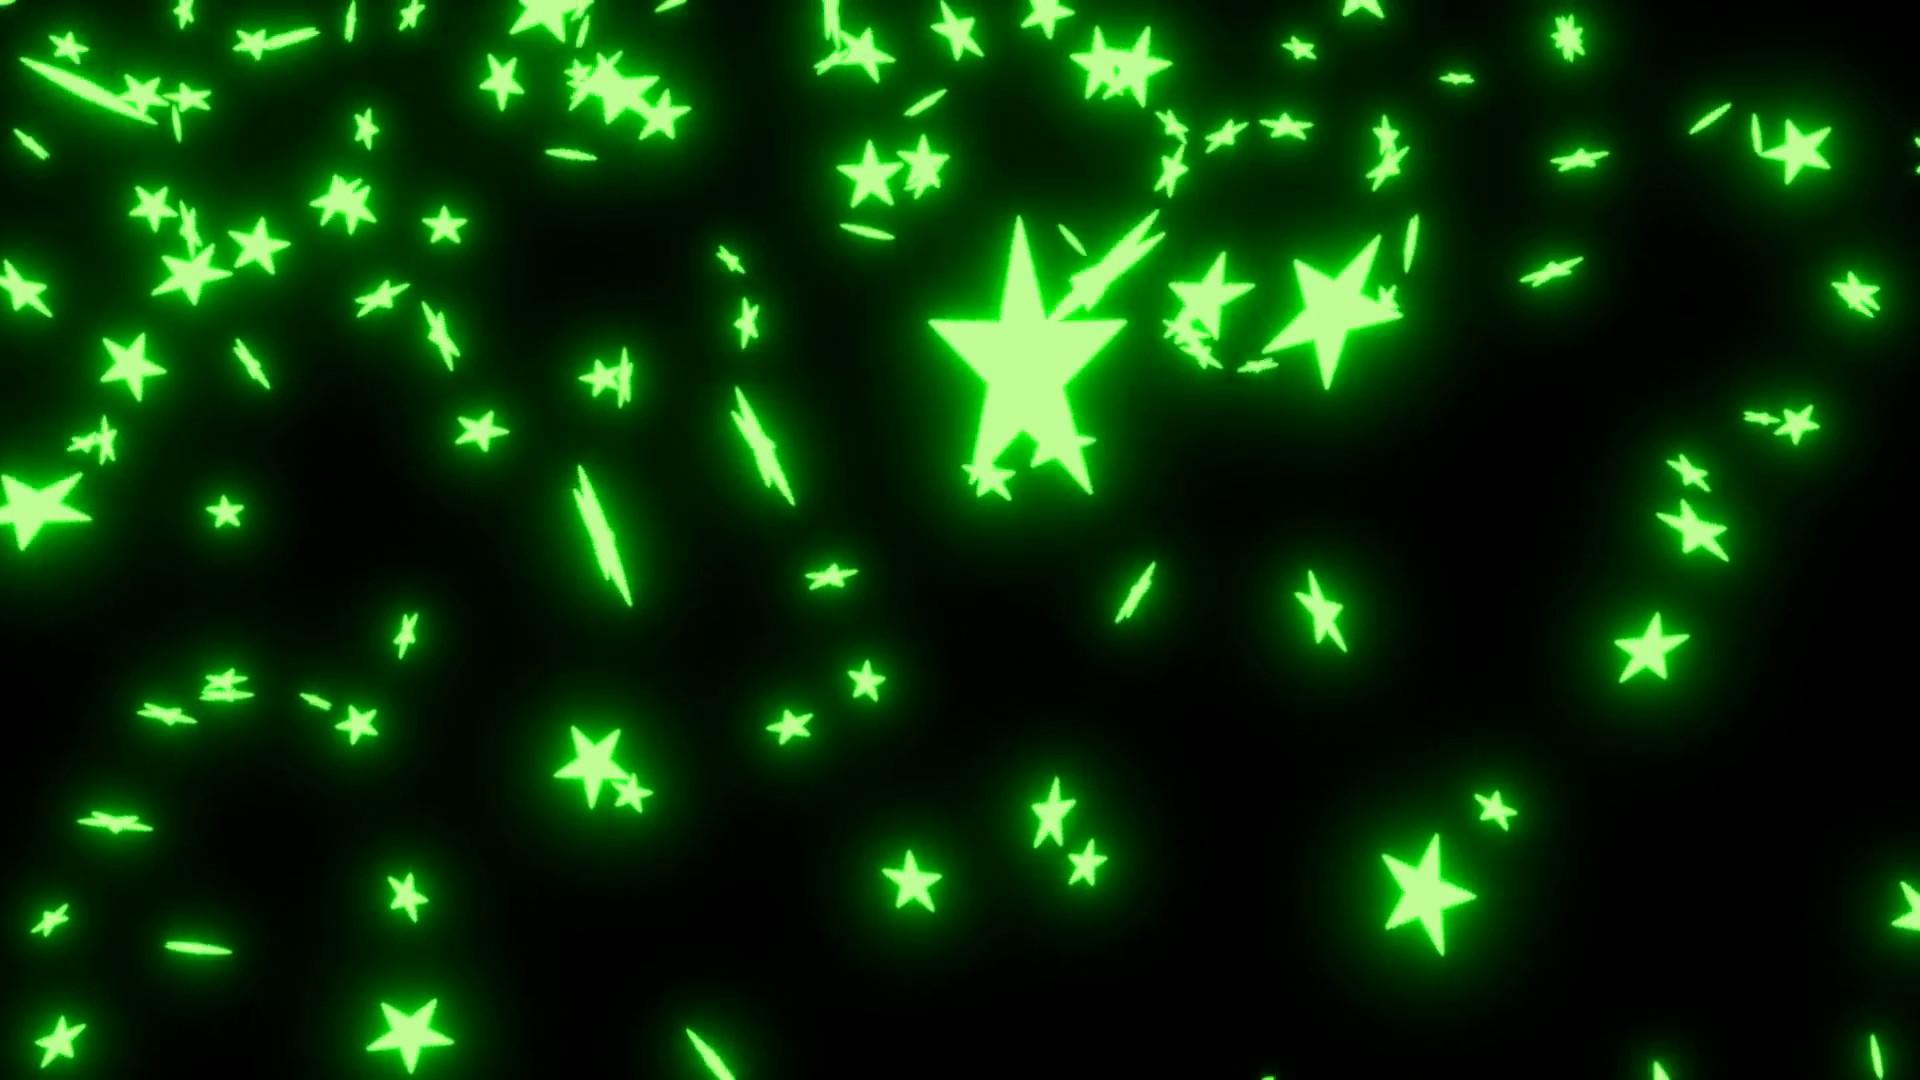 Animated falling neon green stars on black background 2. Motion Background  – VideoBlocks